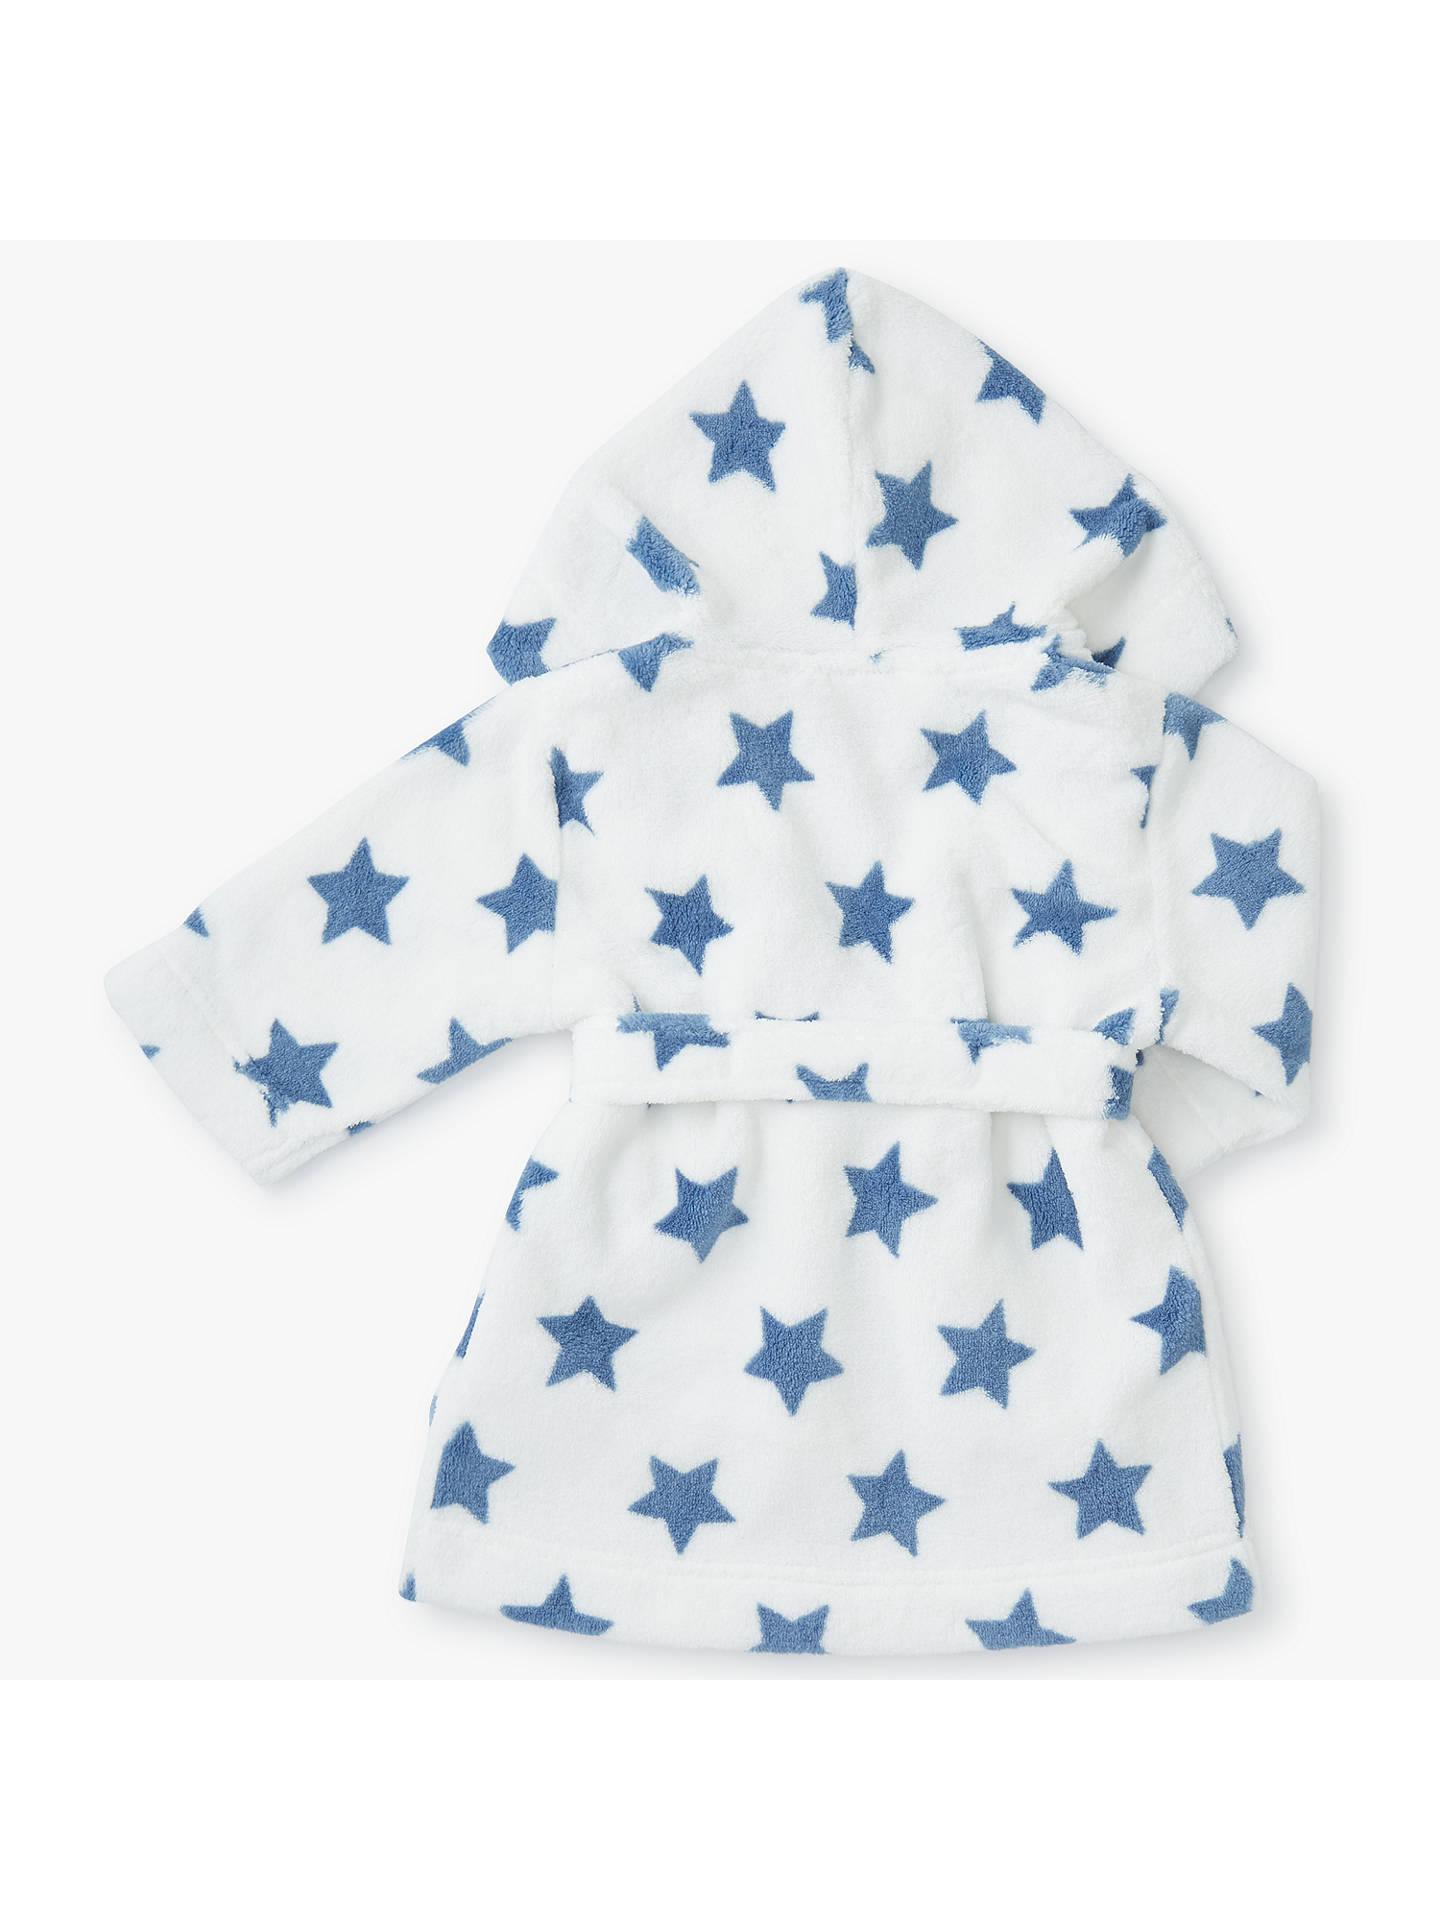 John Lewis Baby Fleece Dressing Gown, Cream at John Lewis & Partners